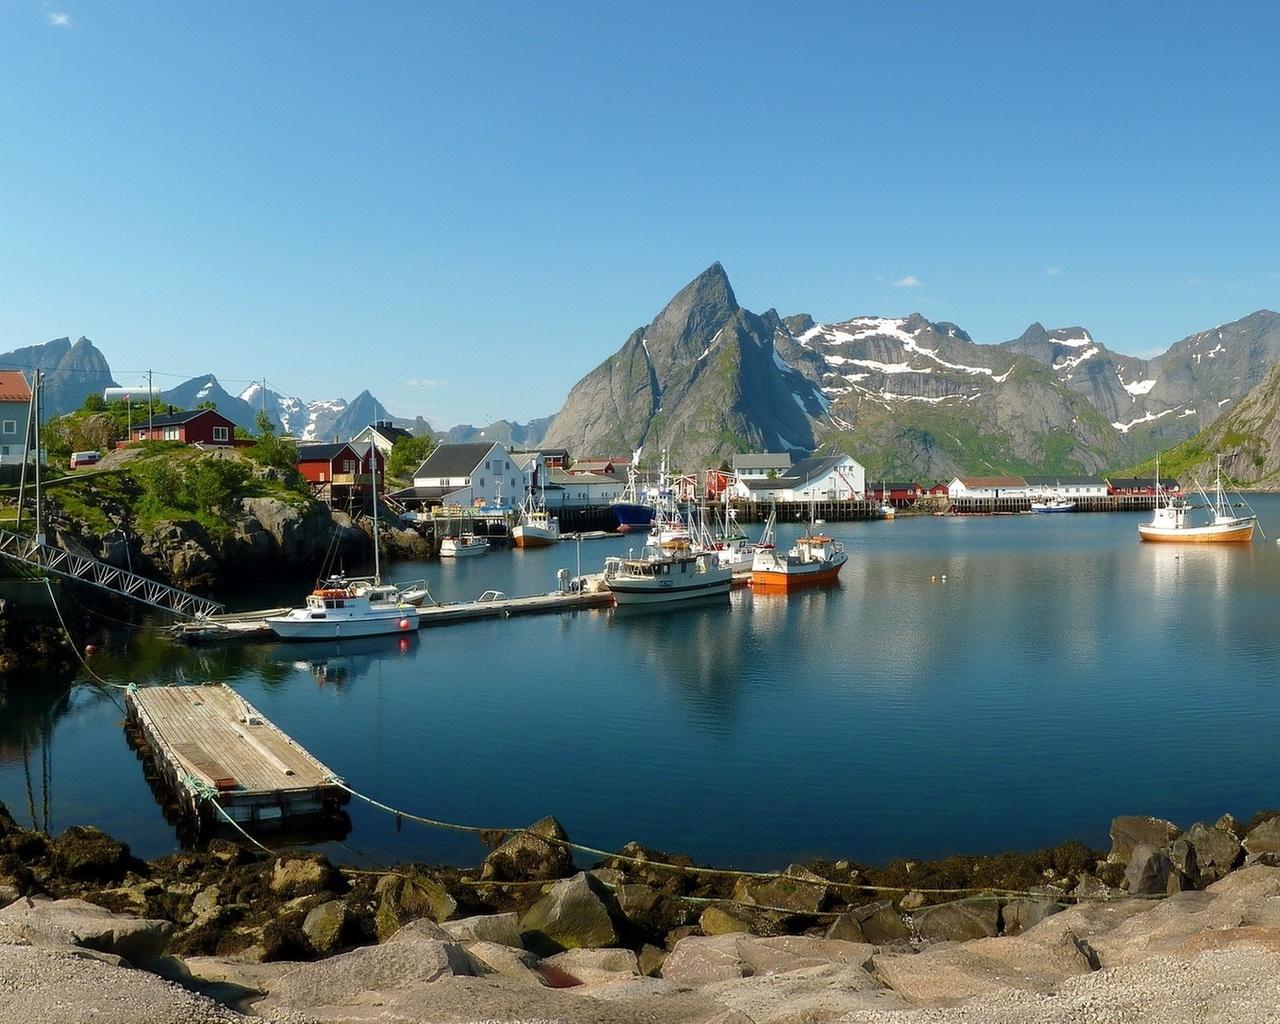 норвегия, норланн